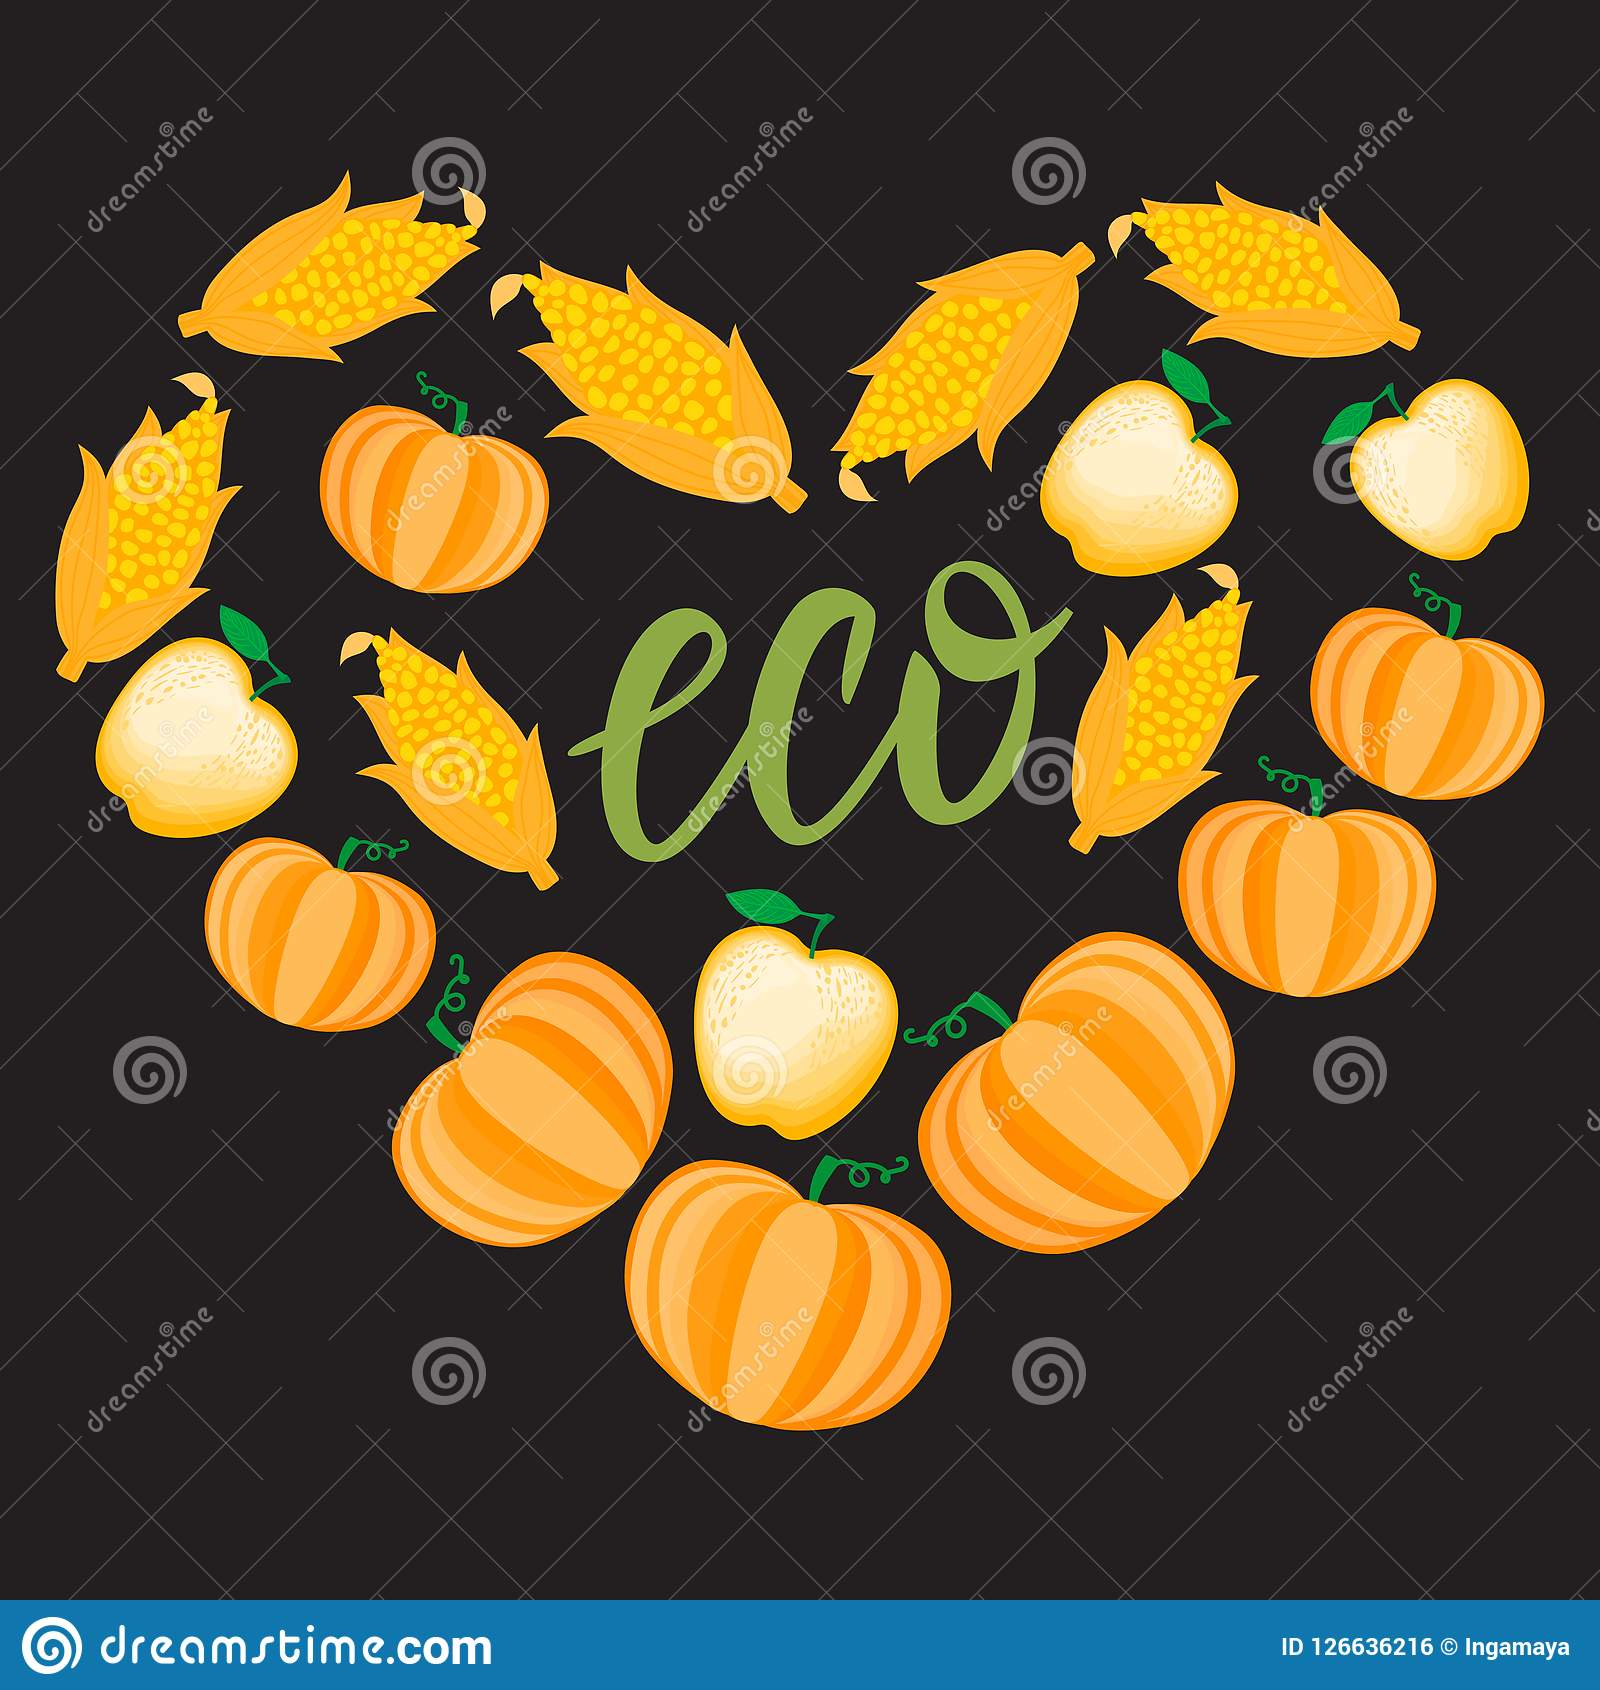 Autumn Cartoon Heart mit orange Gemüsekürbismaisapfel Vektor ilustration lokalisiert auf dunklem Hintergrund